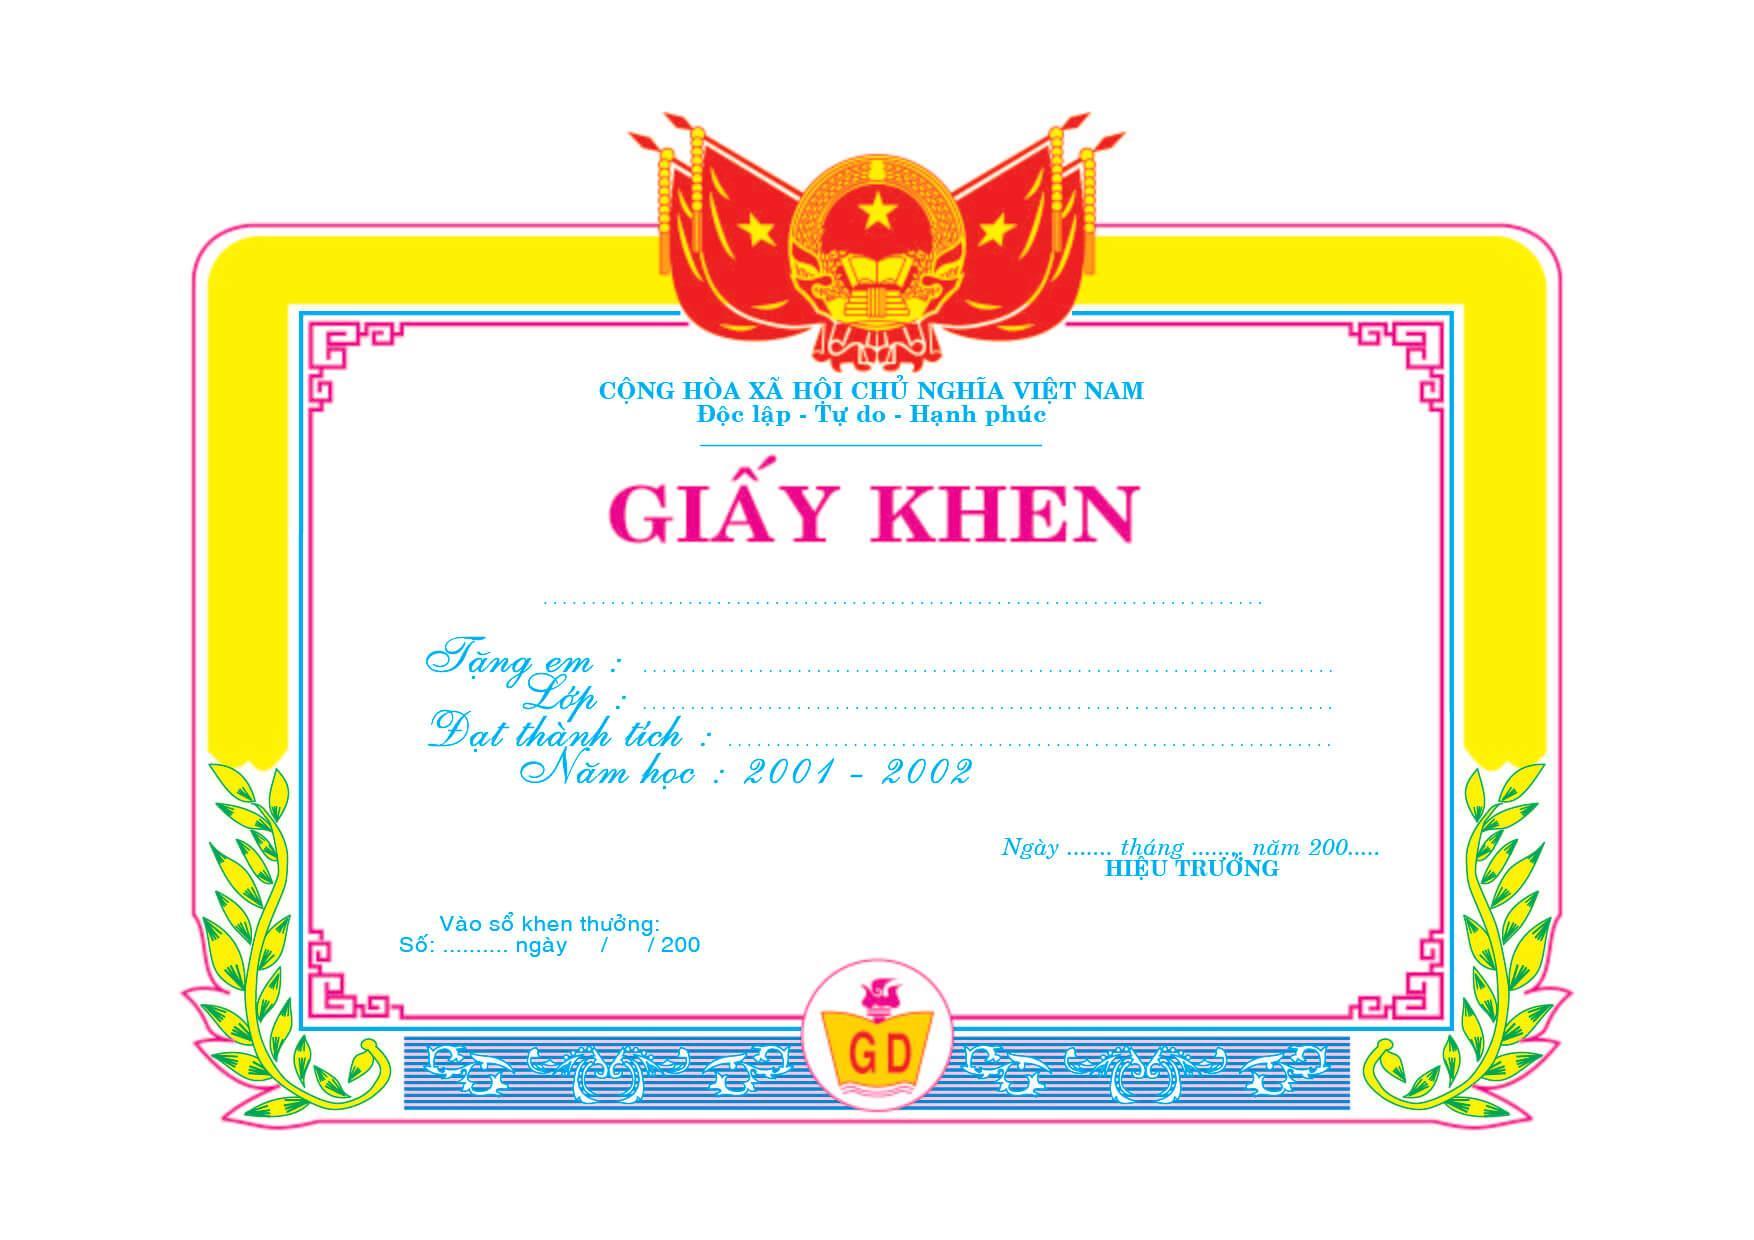 Mẫu giấy khen 026- mẫu giấy khen trường trung học cơ sở - Link Download : https://adsnew.net/8xLwkBk6